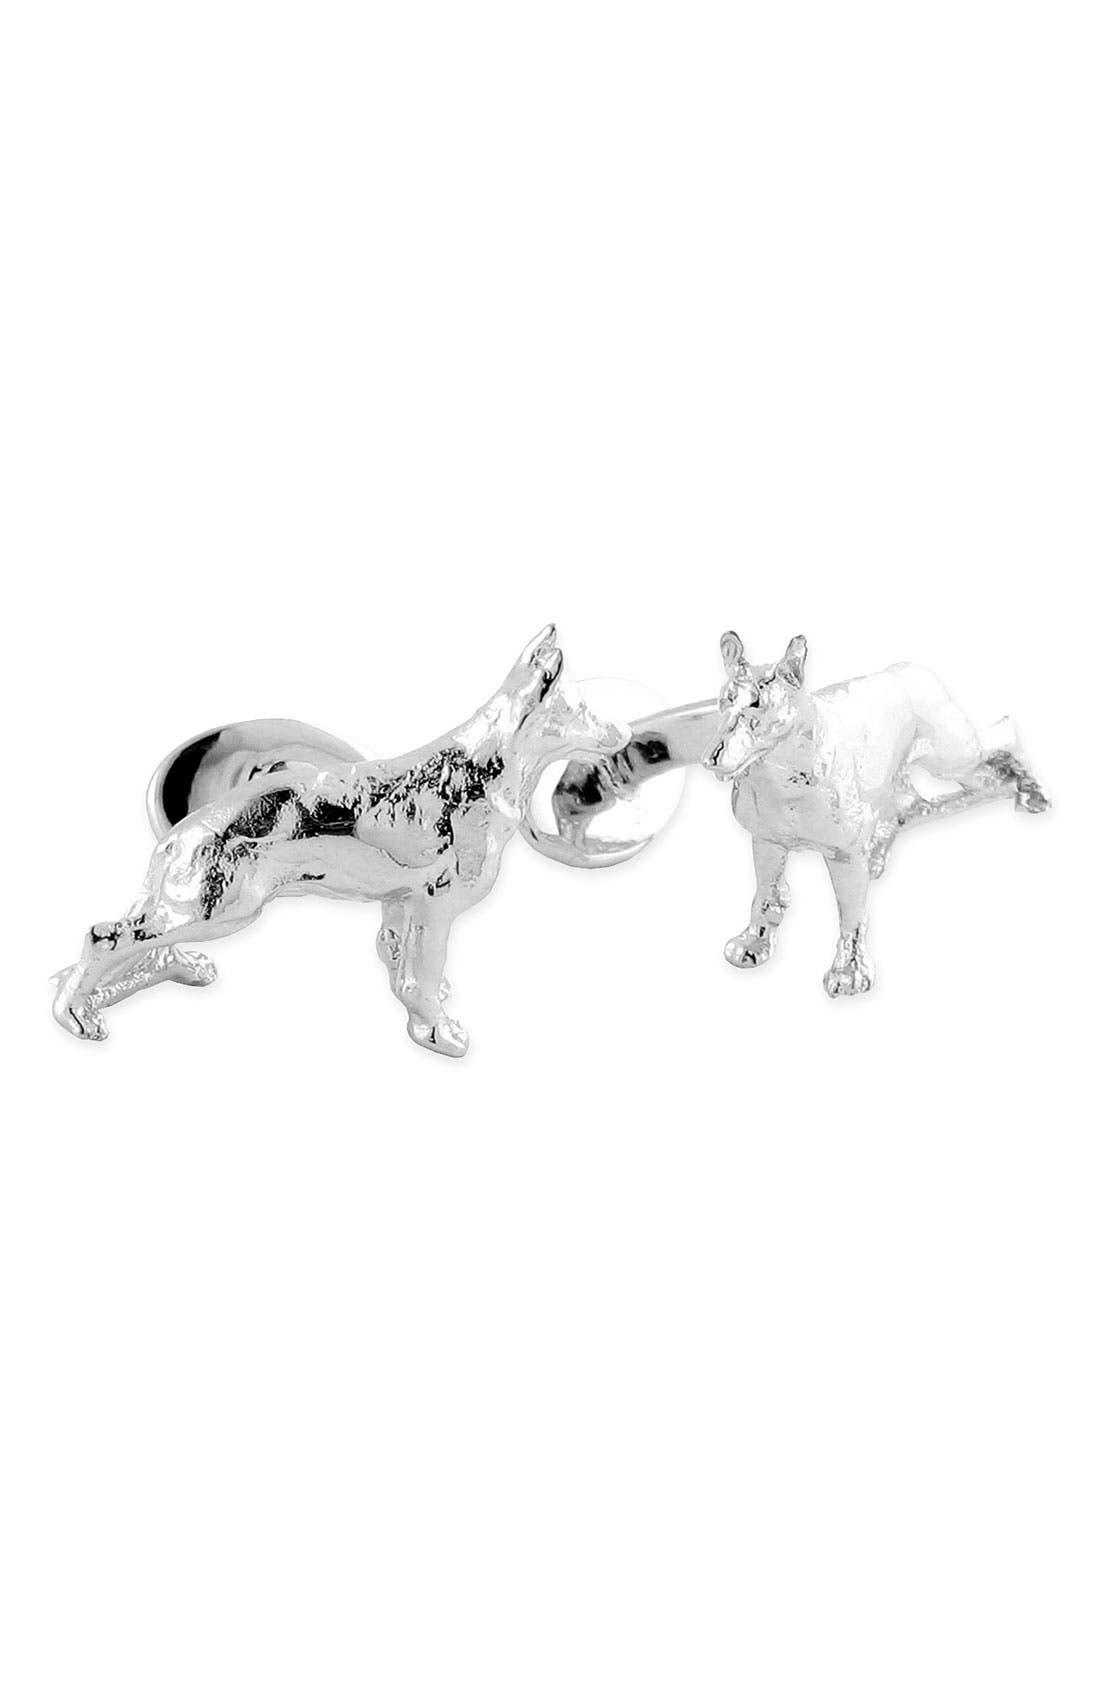 Main Image - David Donahue 'German Shepherd' Sterling Silver Cuff Links